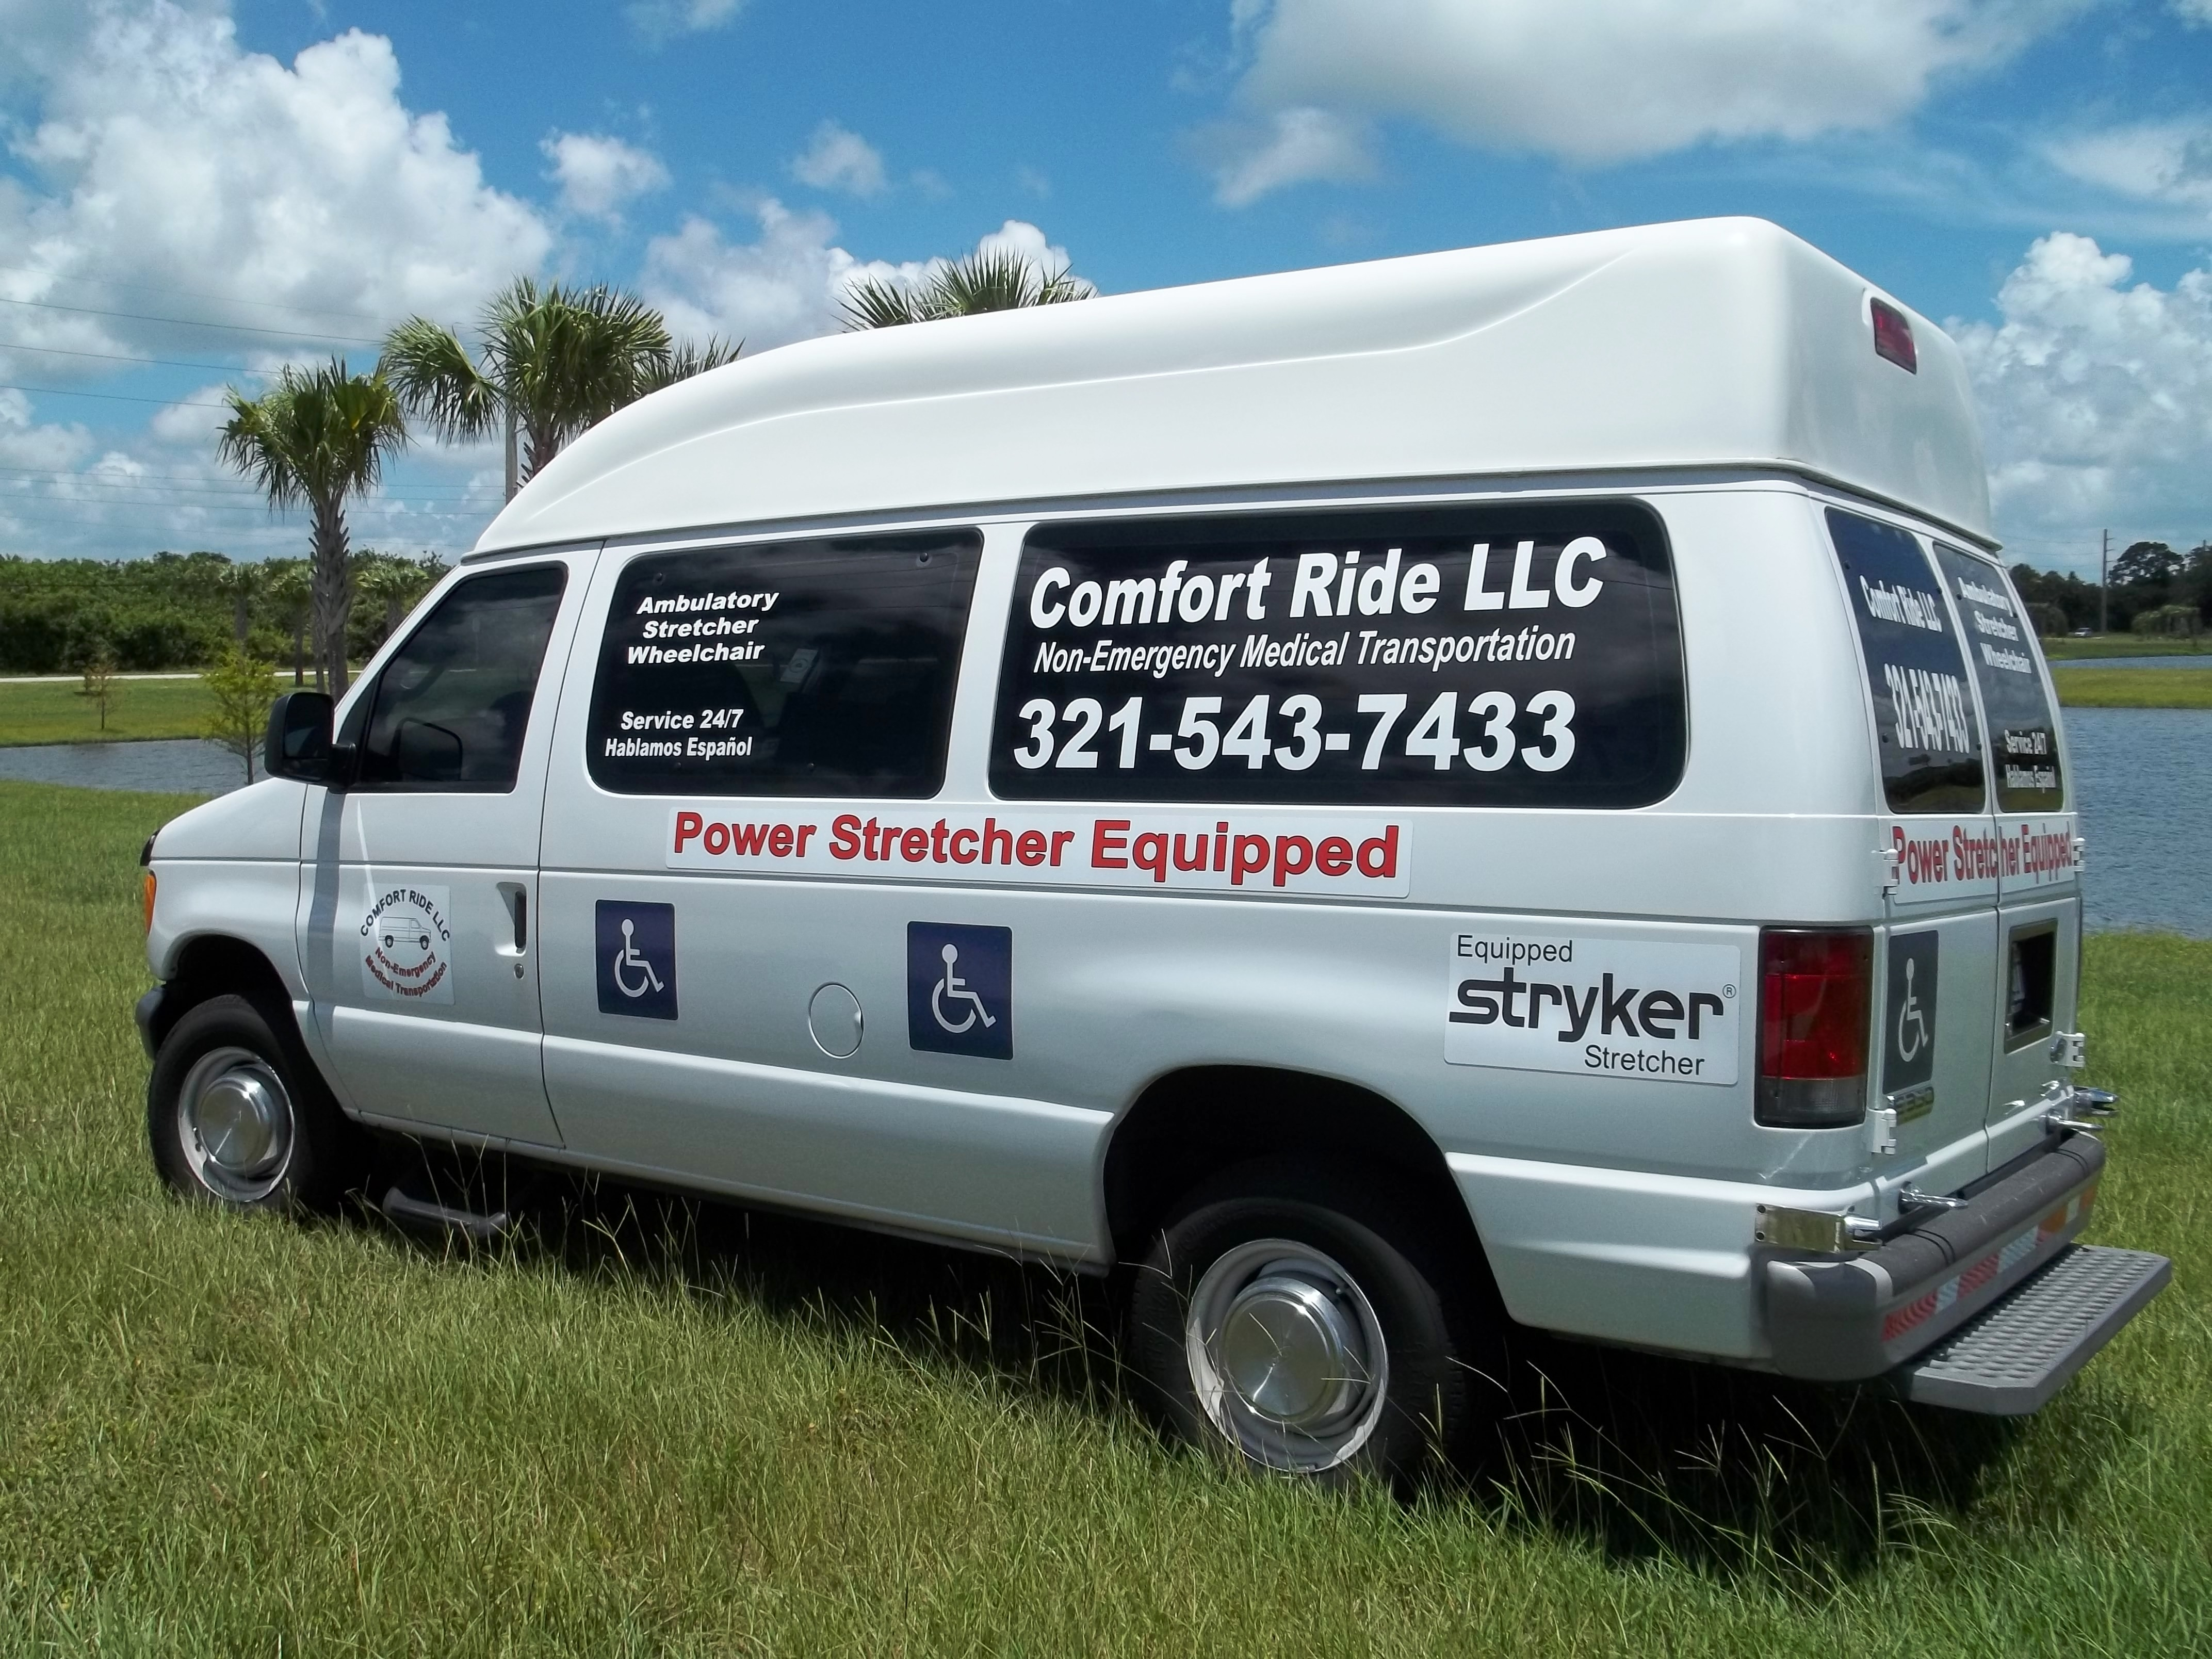 Comfort Ride LLC image 32